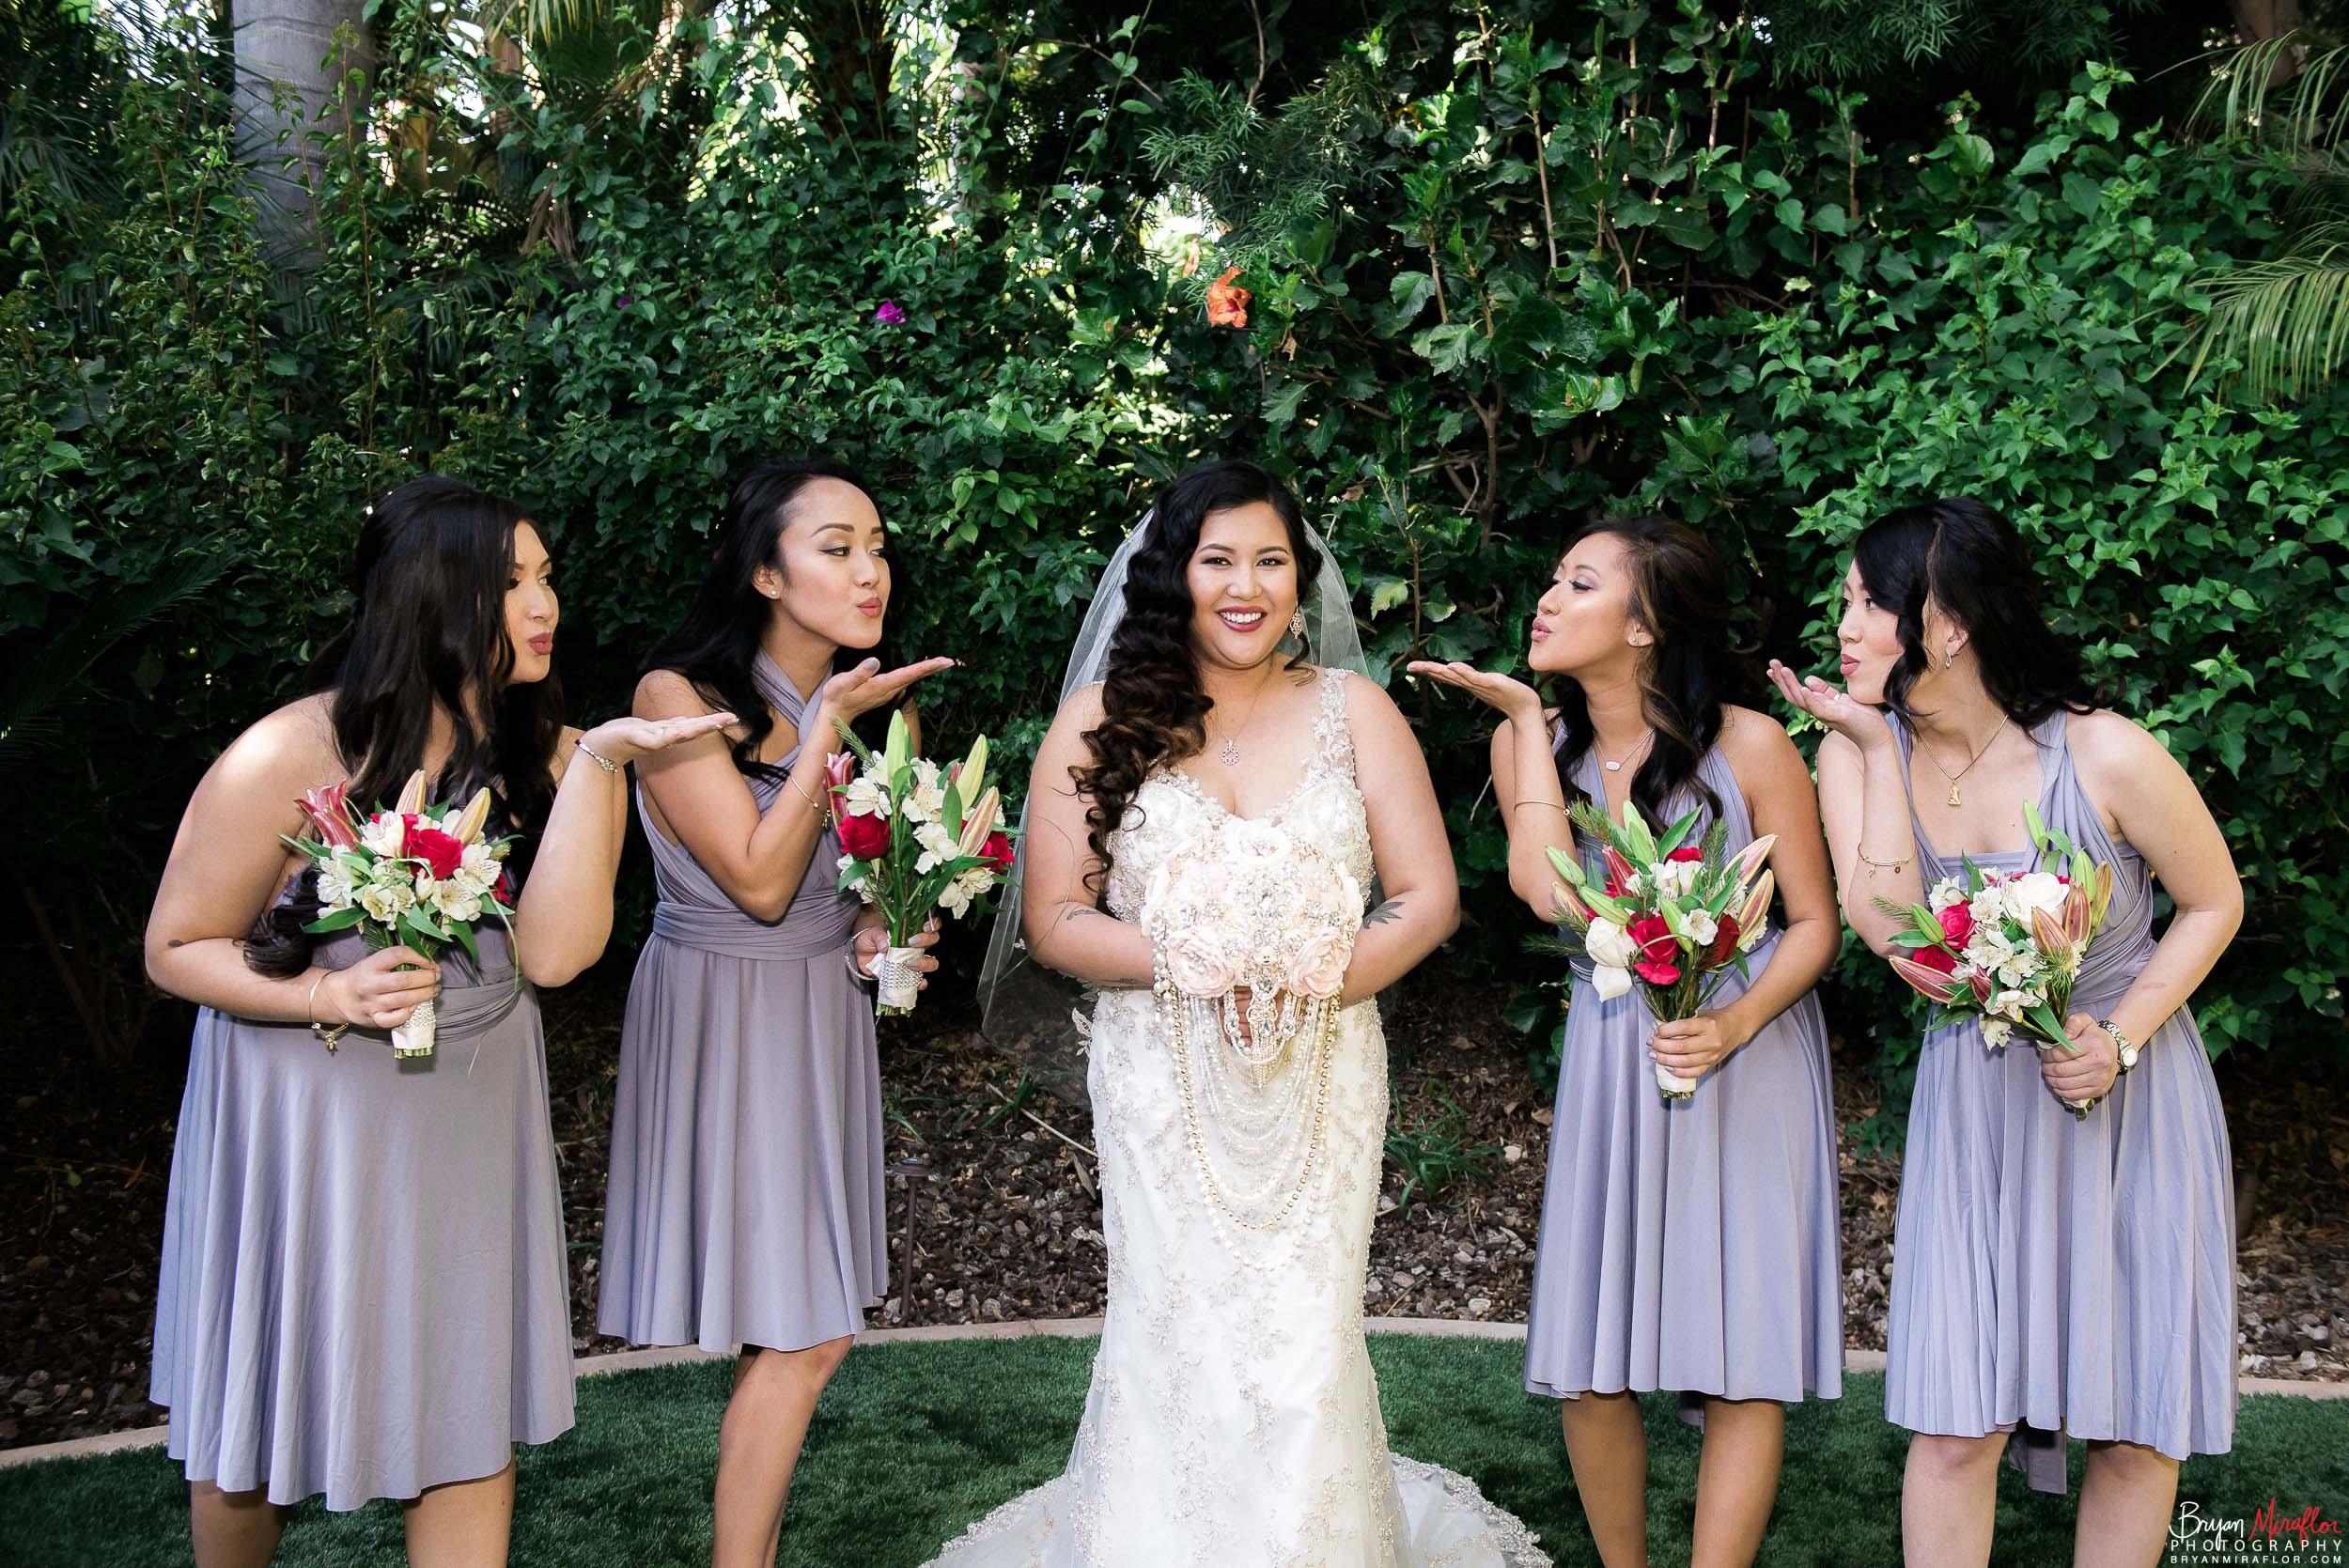 Bryan-Miraflor-Photography-Hannah-Jonathan-Married-Grand-Traditions-Estate-Gardens-Fallbrook-20171222-114.jpg